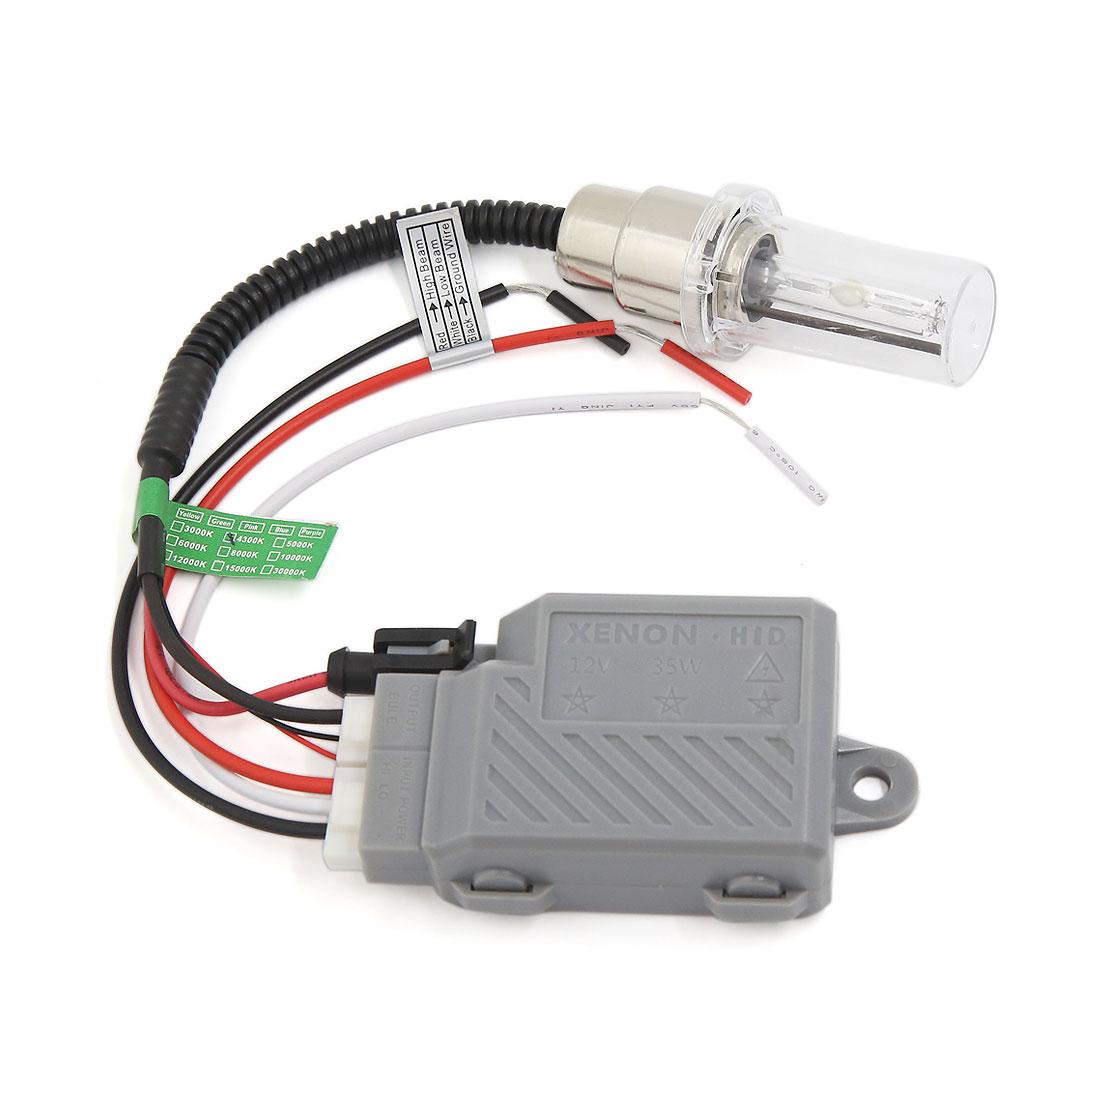 Universal Motorcycle HID Hi/Lo Beam Xenon Light Lamp Headlight kit 4300K 35W